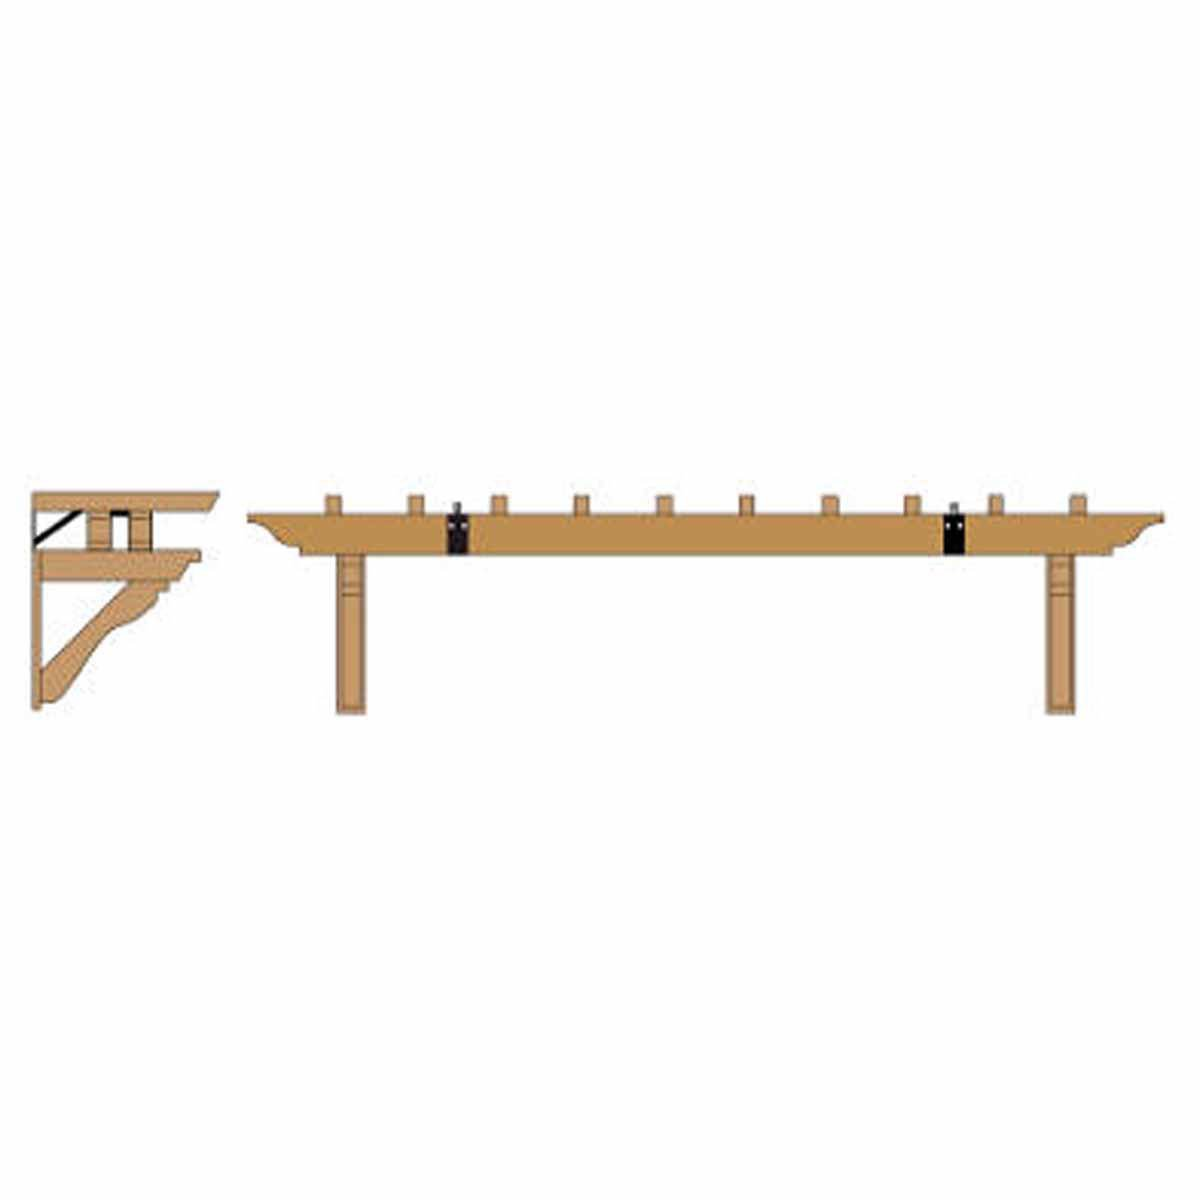 Fypon TRLS18988 Wood Grain Trellis Kit, Fits 8' and 9' Garage Doors